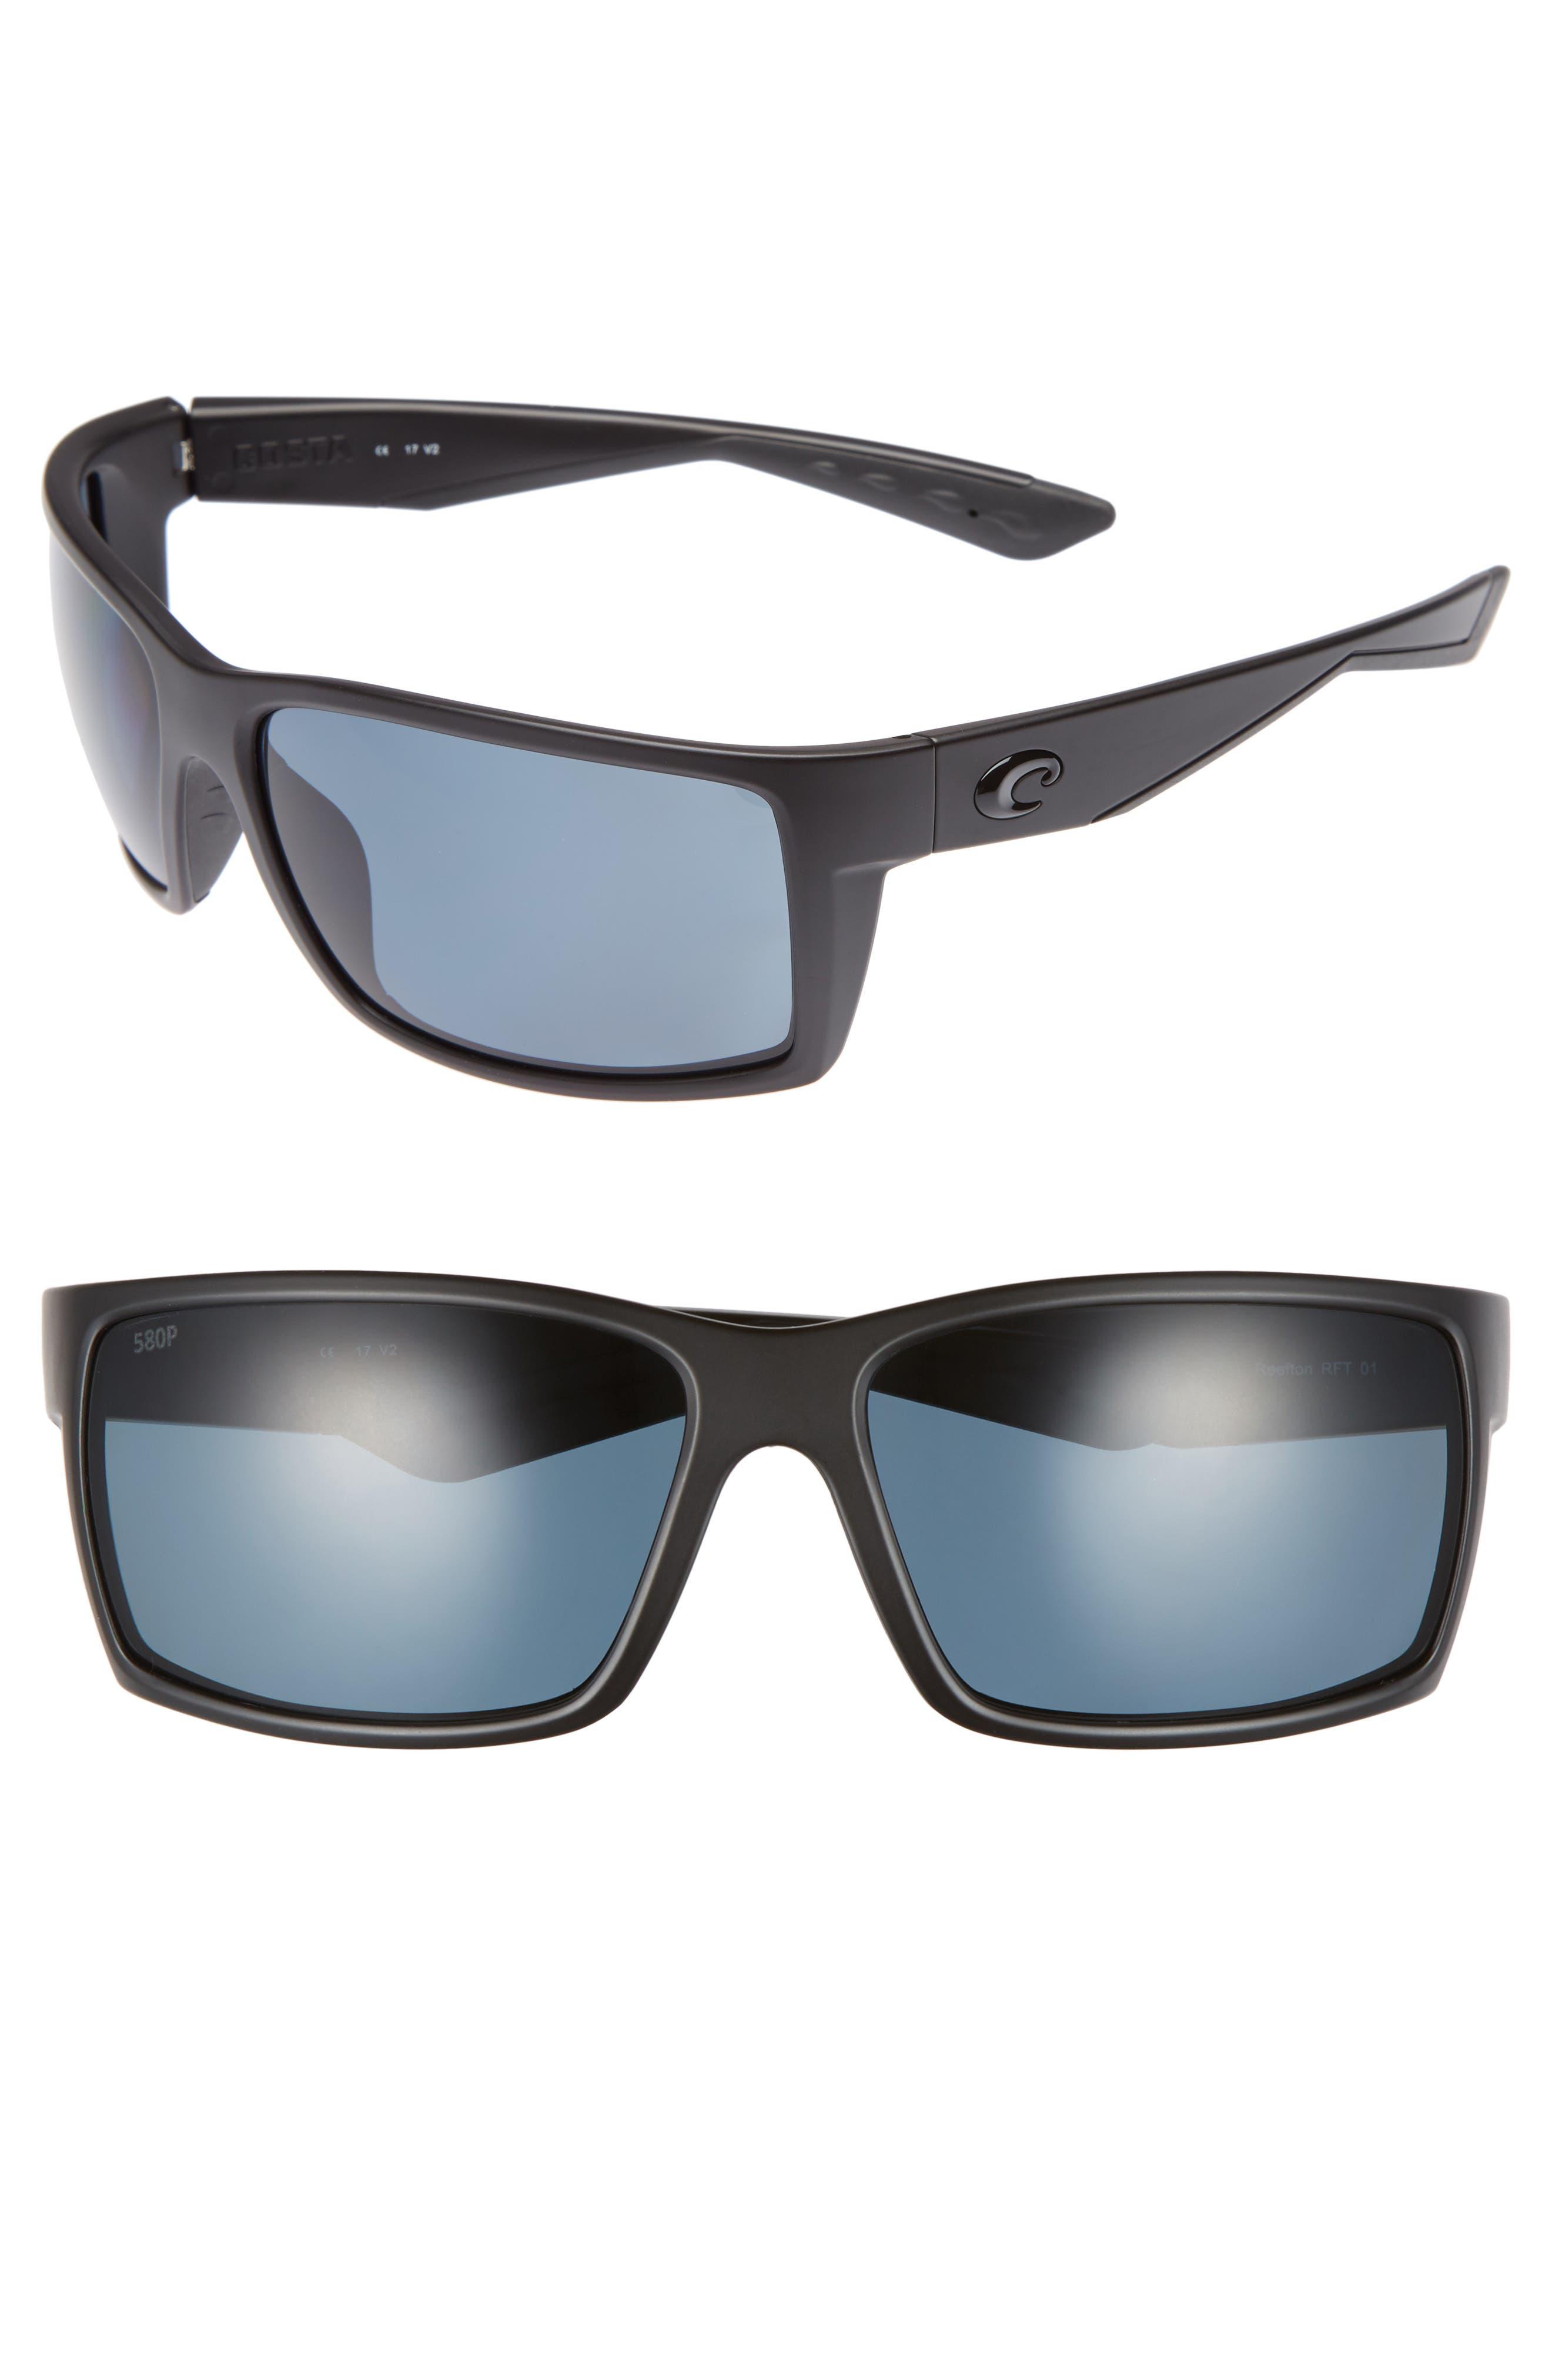 Reefton 65mm Polarized Sunglasses